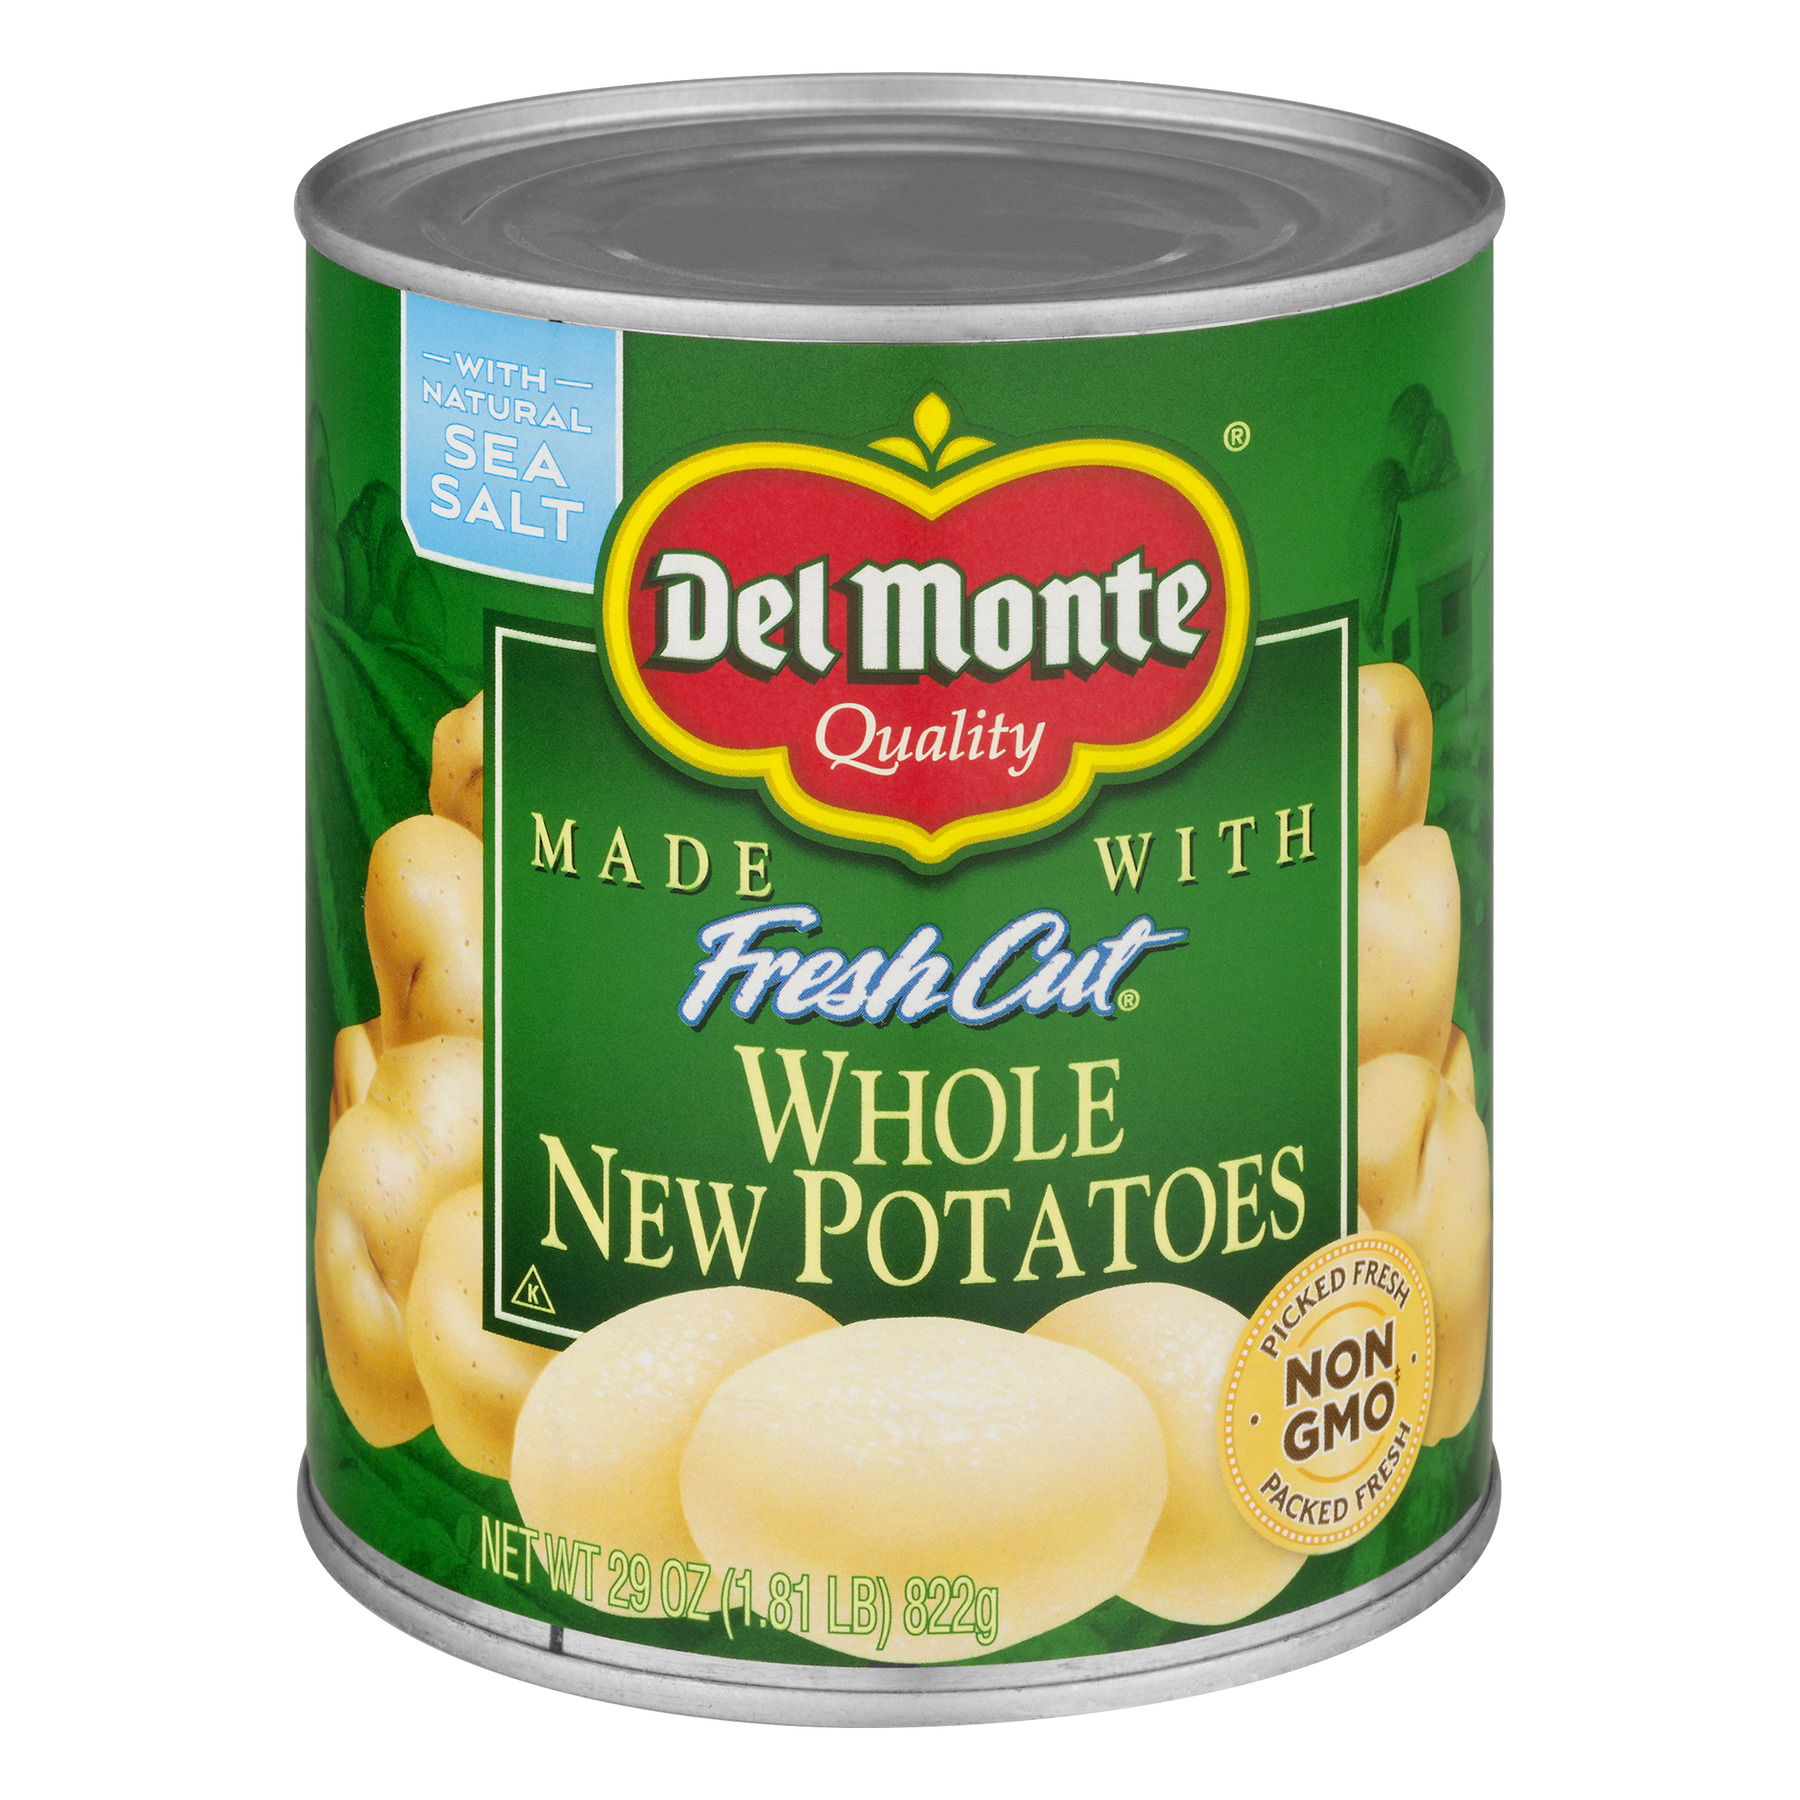 Del Monte Fresh Cut Whole New Potatoes, 29 Oz